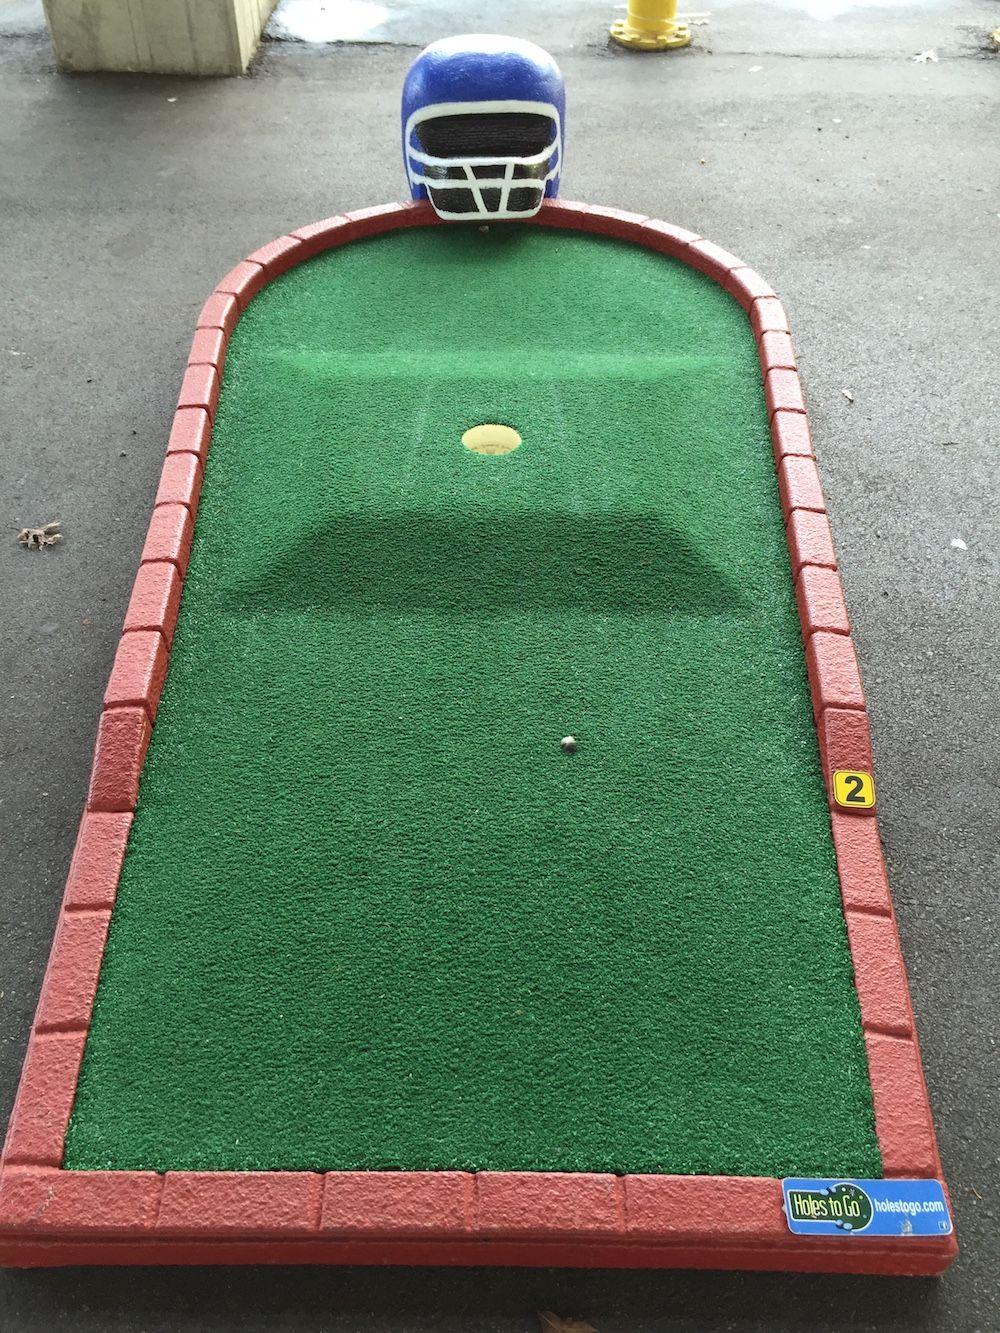 Football Themed Portable Mini Golf Course & Tent Rentals